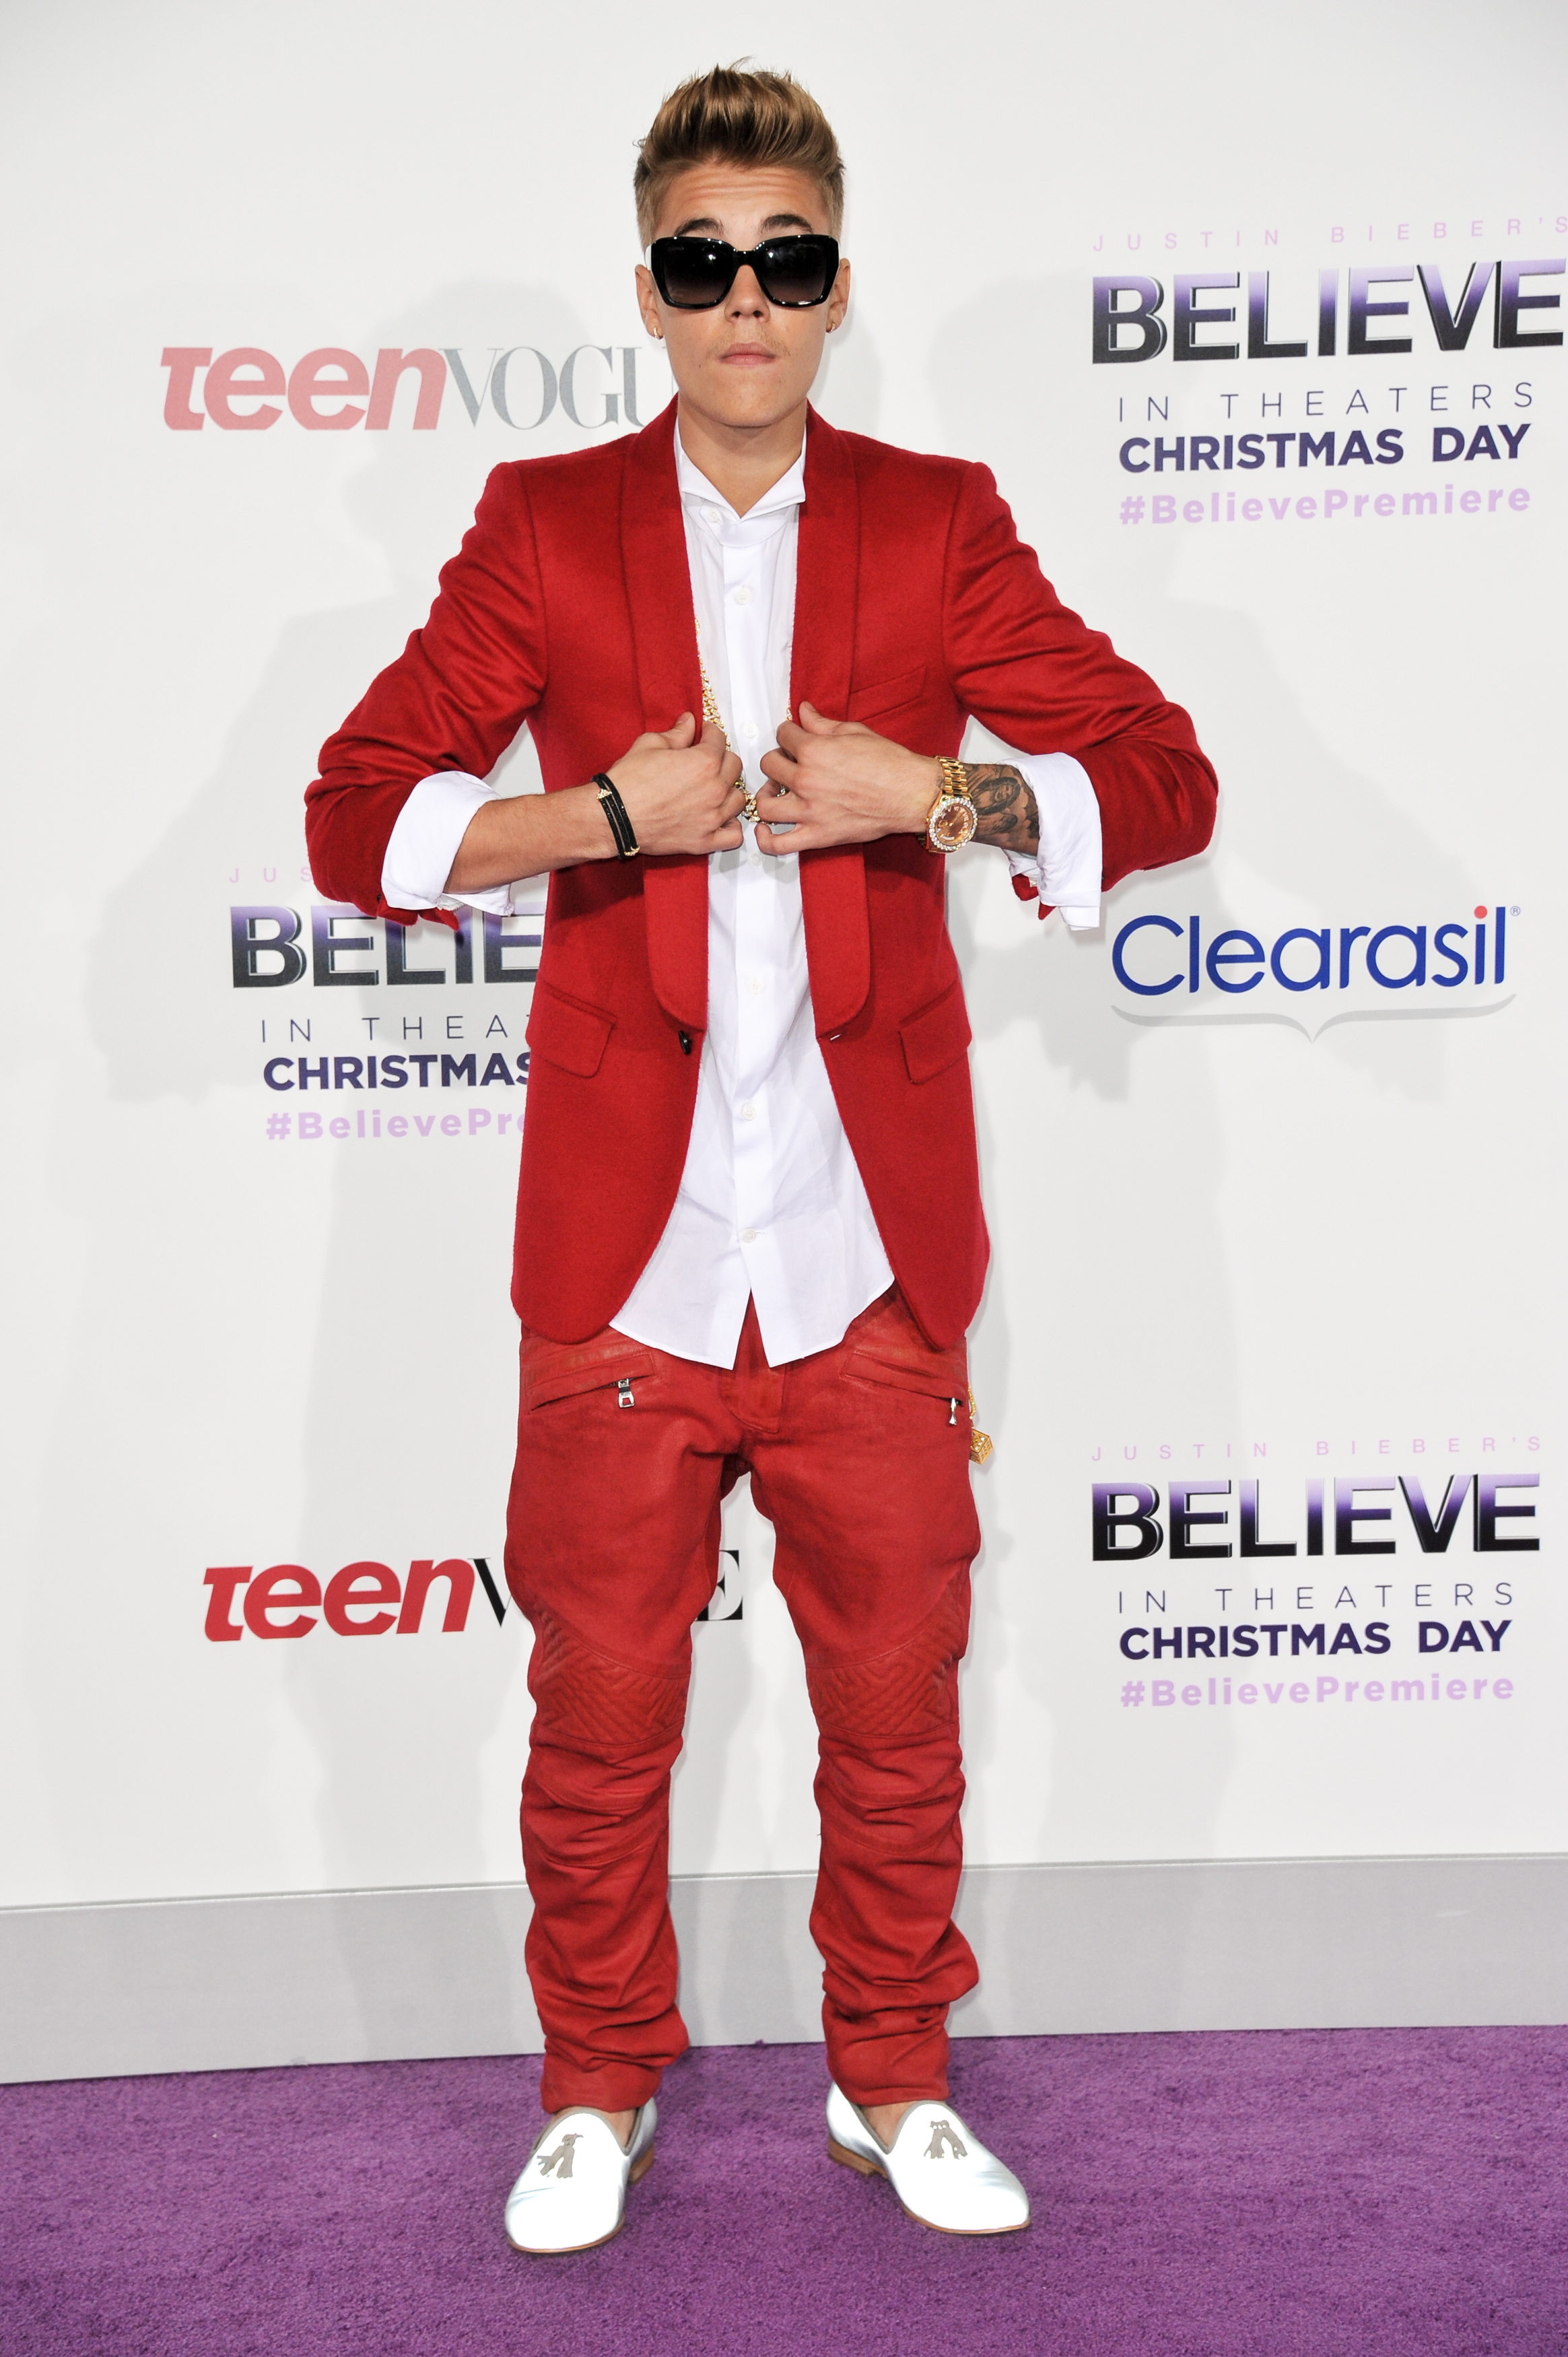 justin bieber red suit